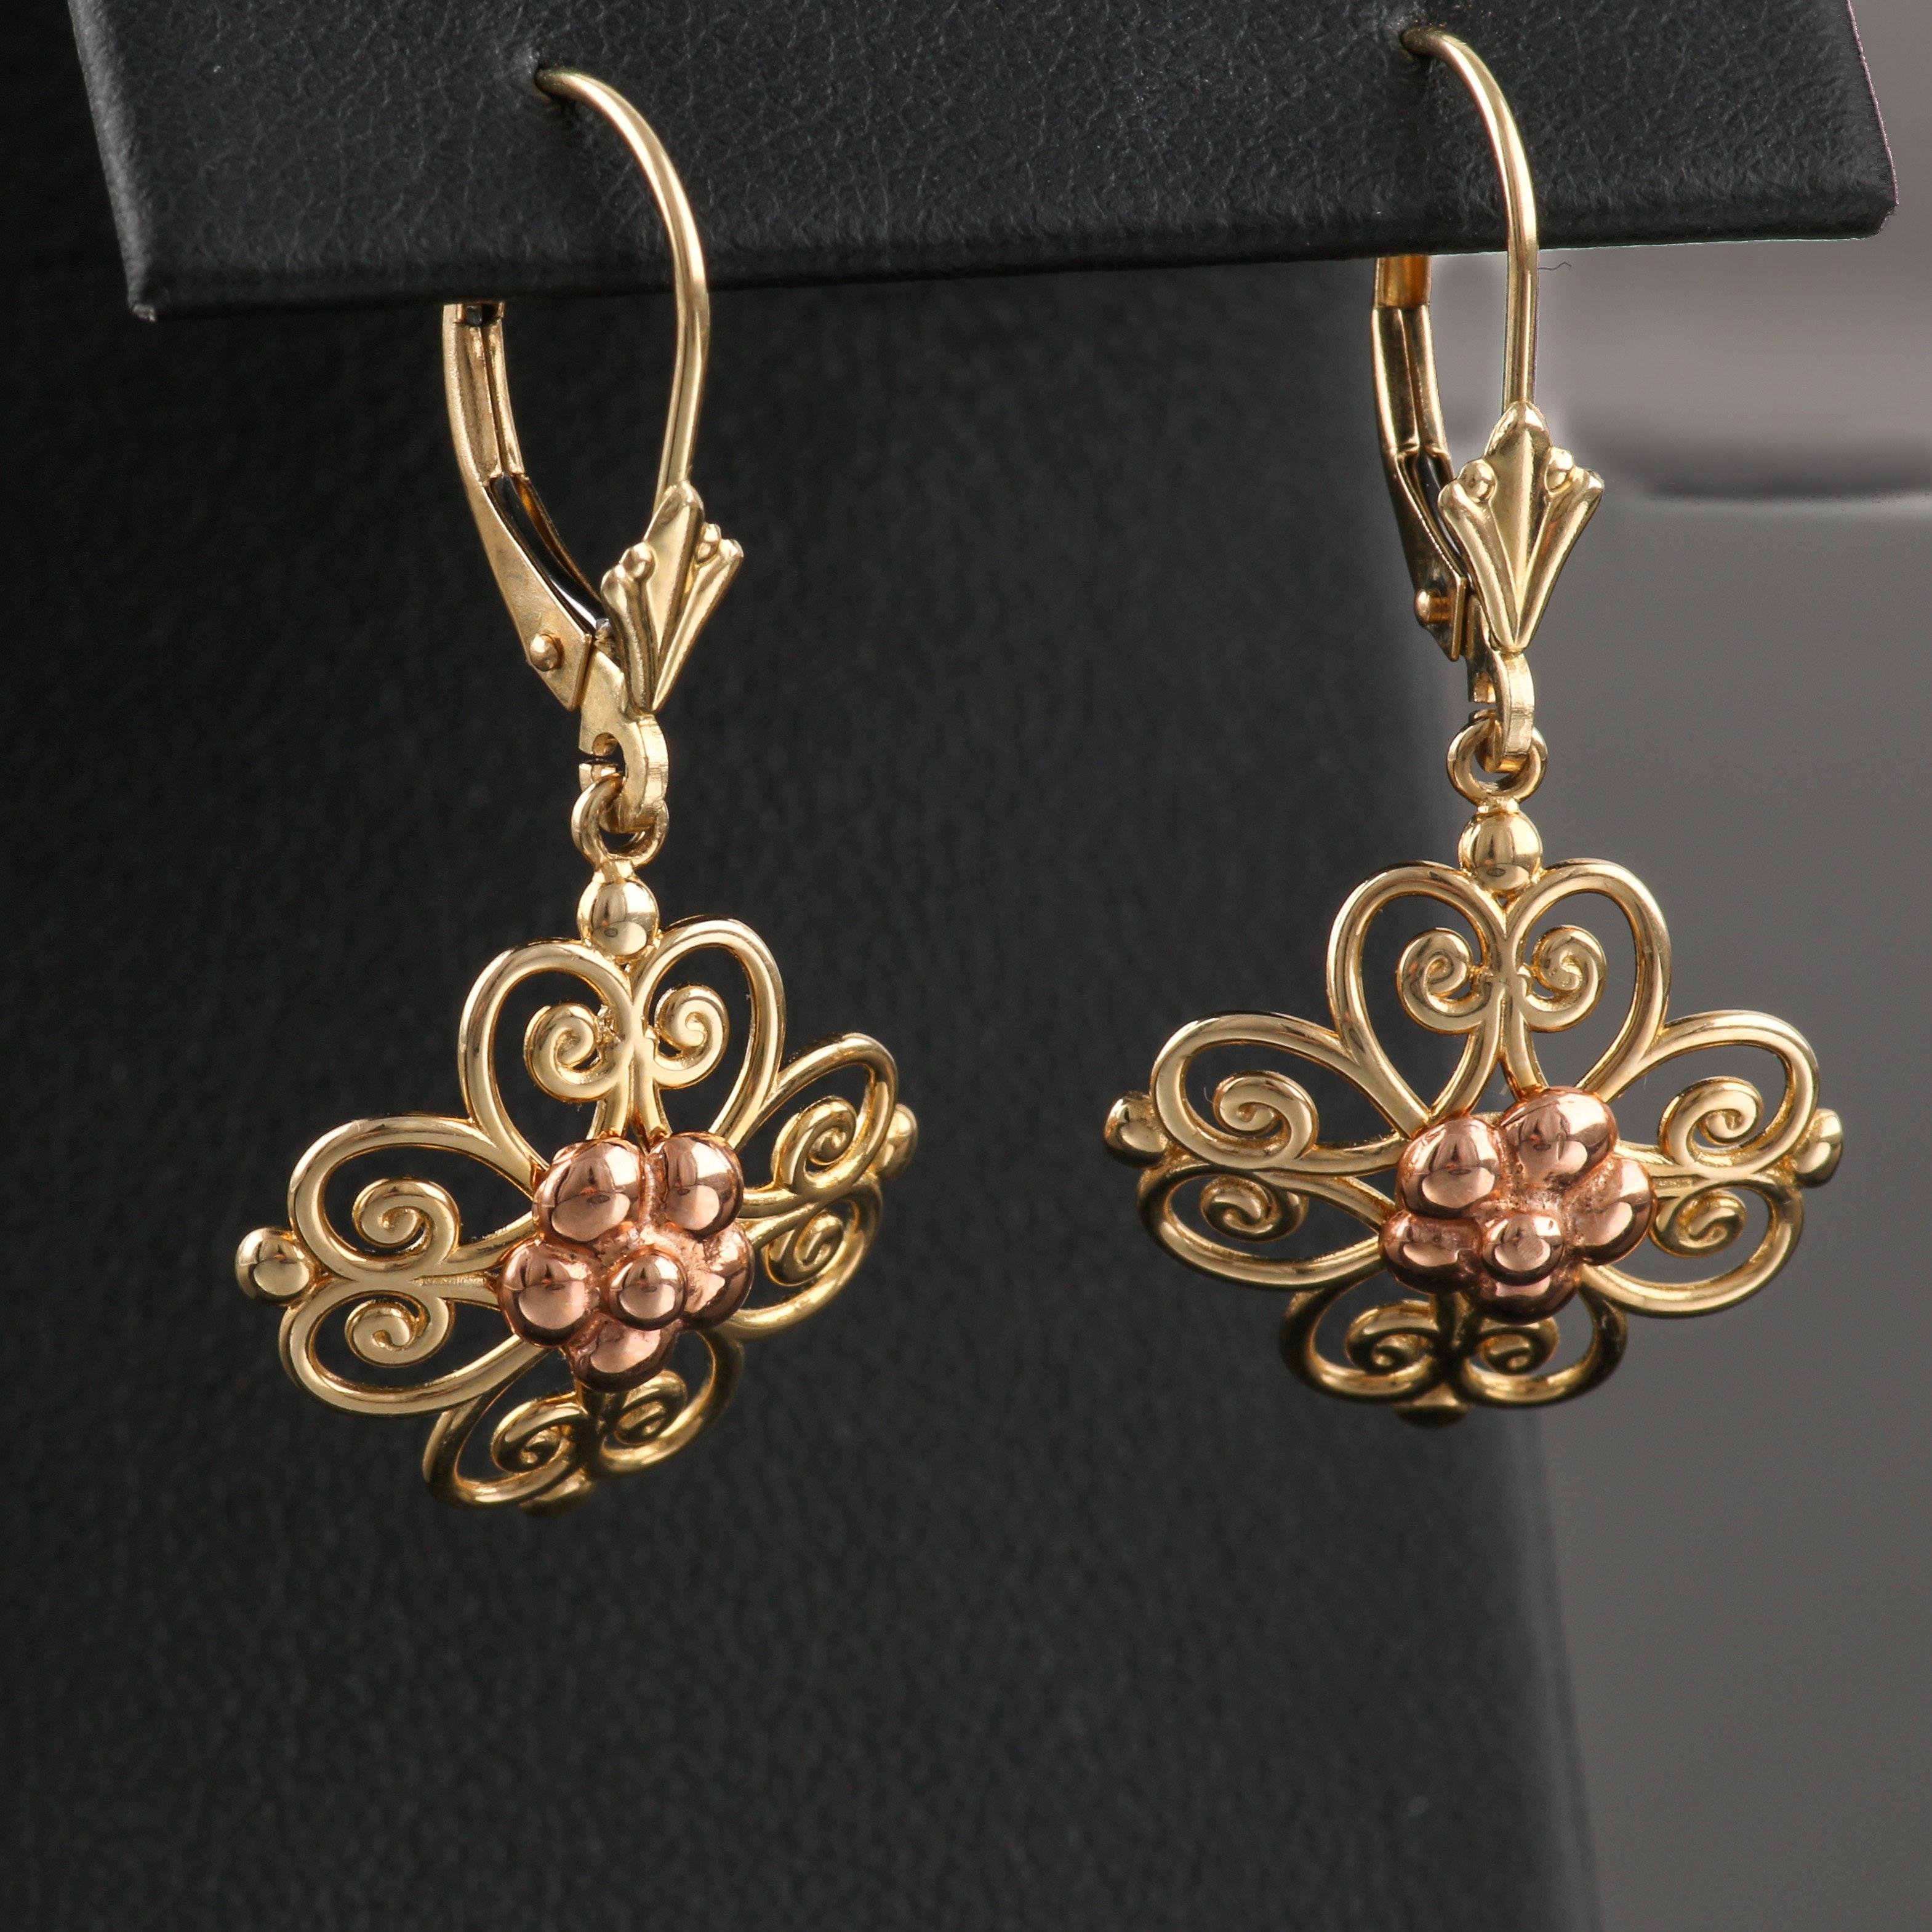 14K Yellow Gold Two-Tone Earrings